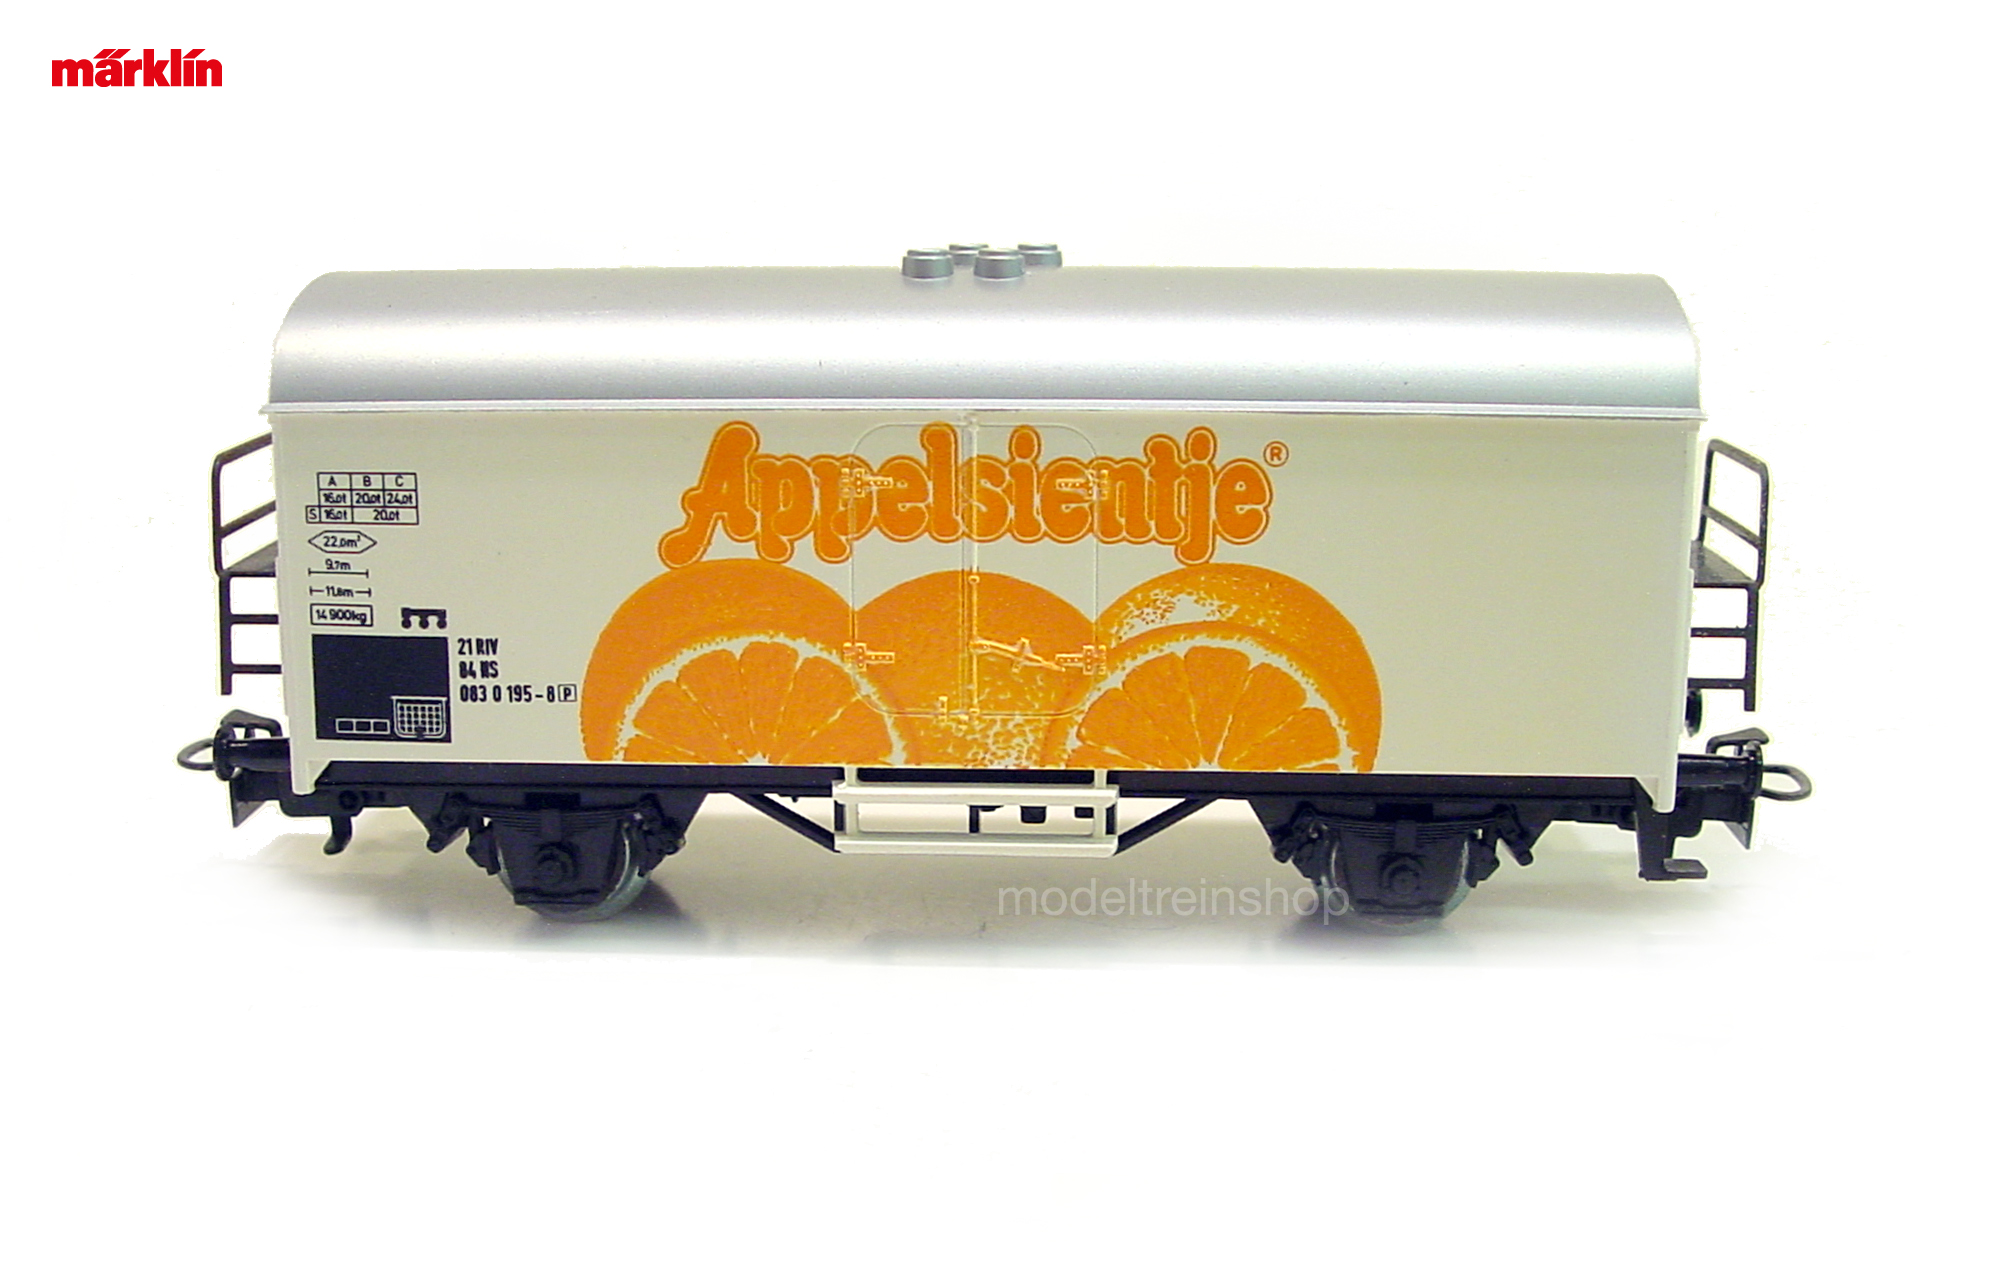 Marklin H0 844158 4415 V2 Gesloten Goederenwagen Appelsientje – NS Modeltreinshop